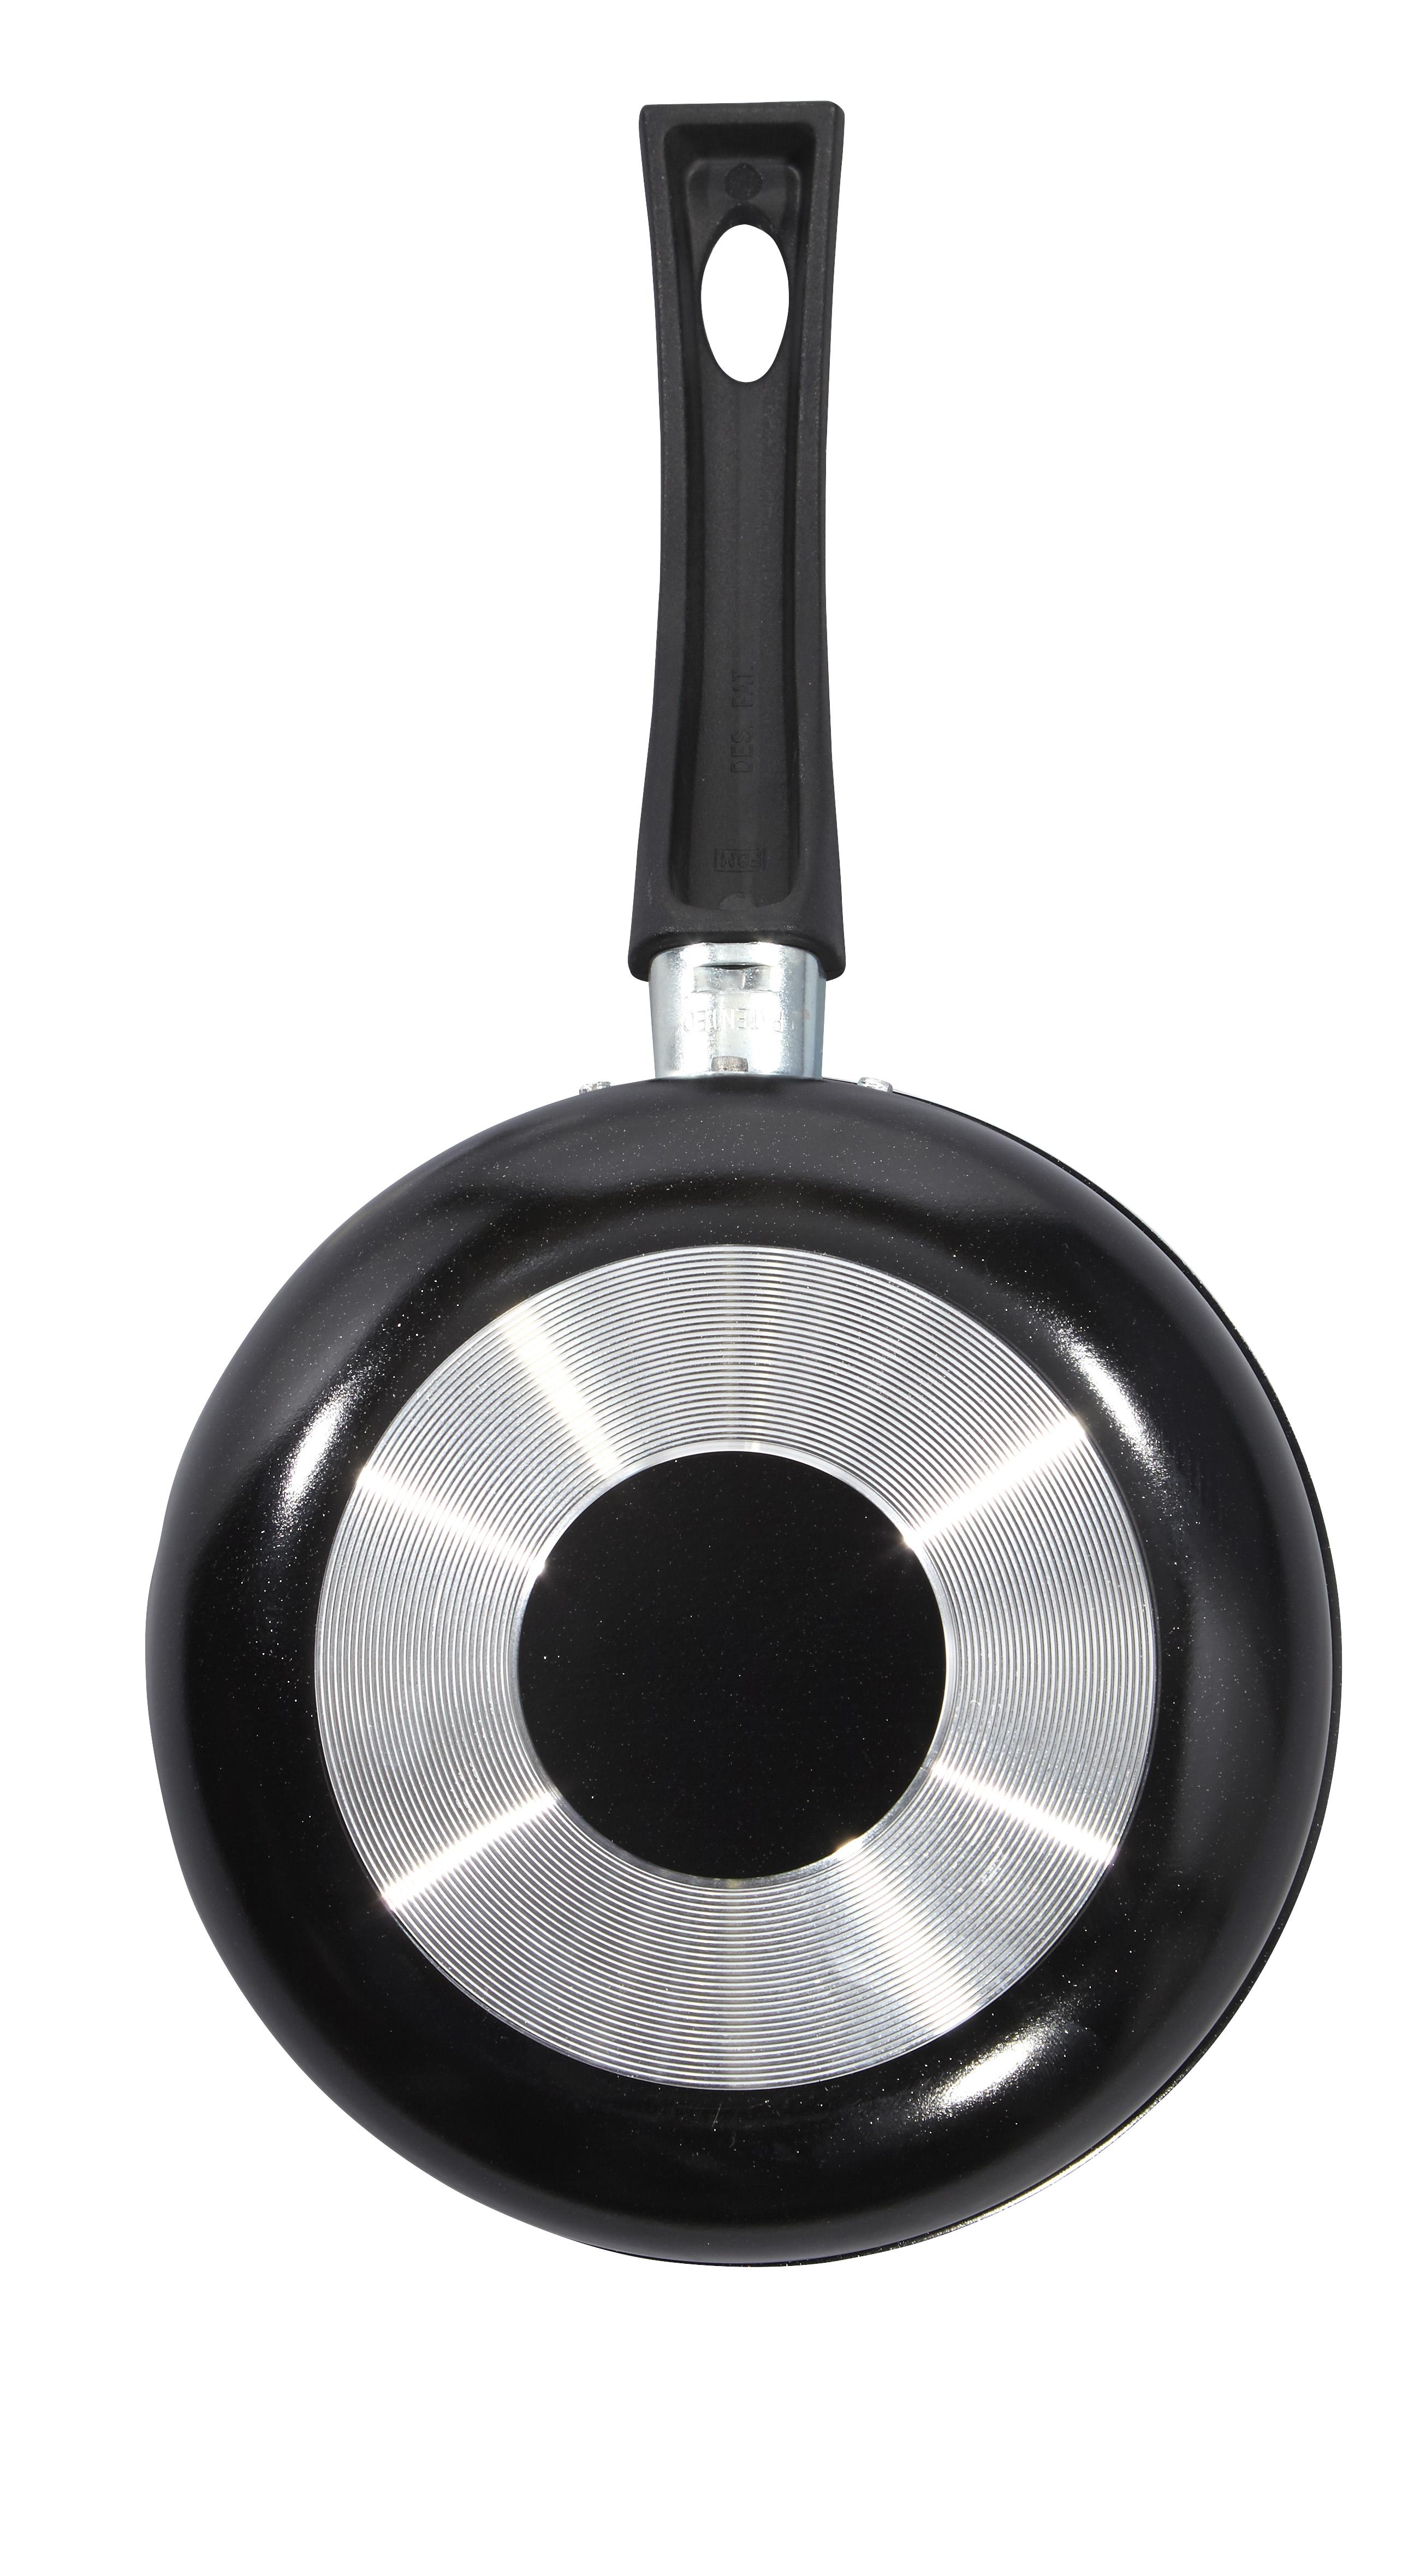 Premier Prix - Lot de casseroles Aluminium - 14 + 16 + 20 cm - 0011646530